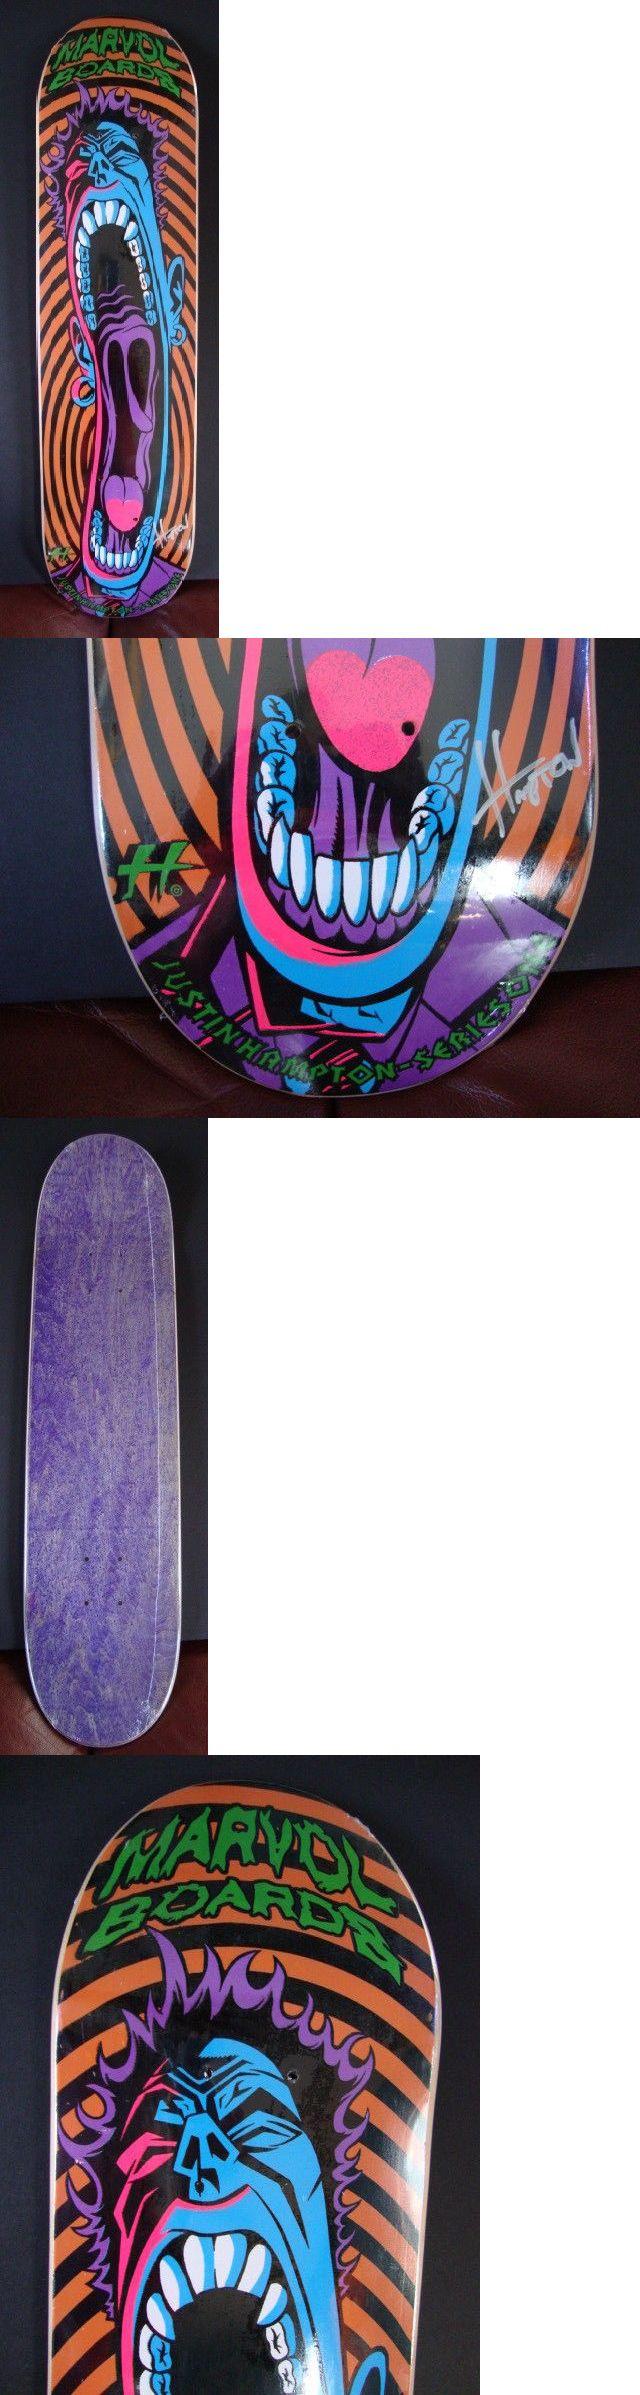 4b5cc3ac Decks 165944: Justin Hampton Marvol Skate Deck Orange Edition Signed -> BUY  IT NOW ONLY: $225 on eBay!